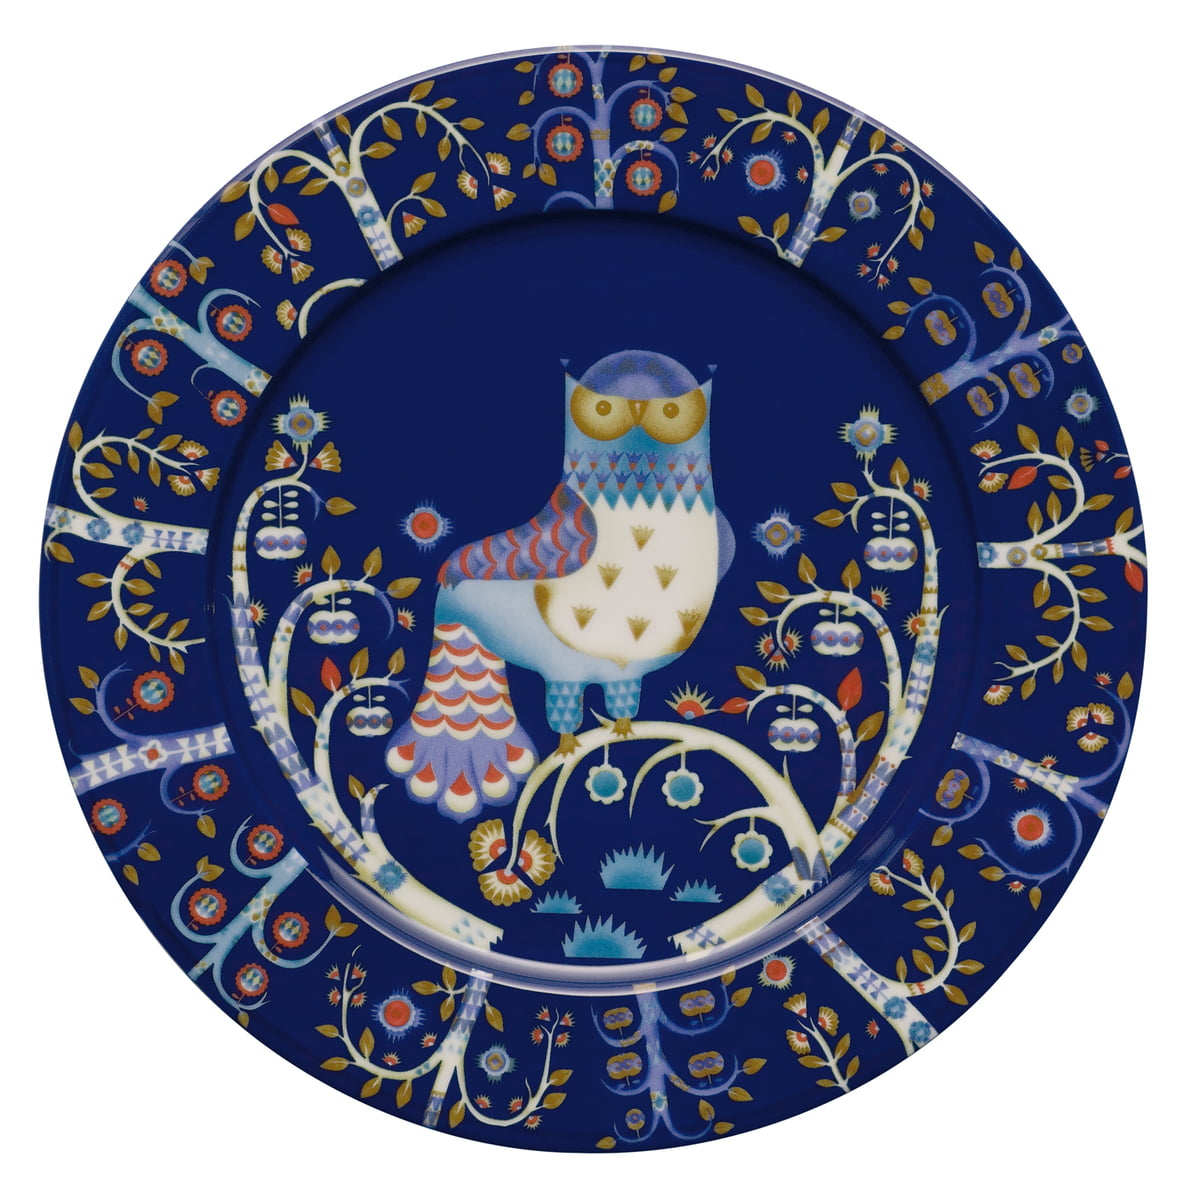 Taika blau von iittala im wohndesign shop for Wohndesign blau